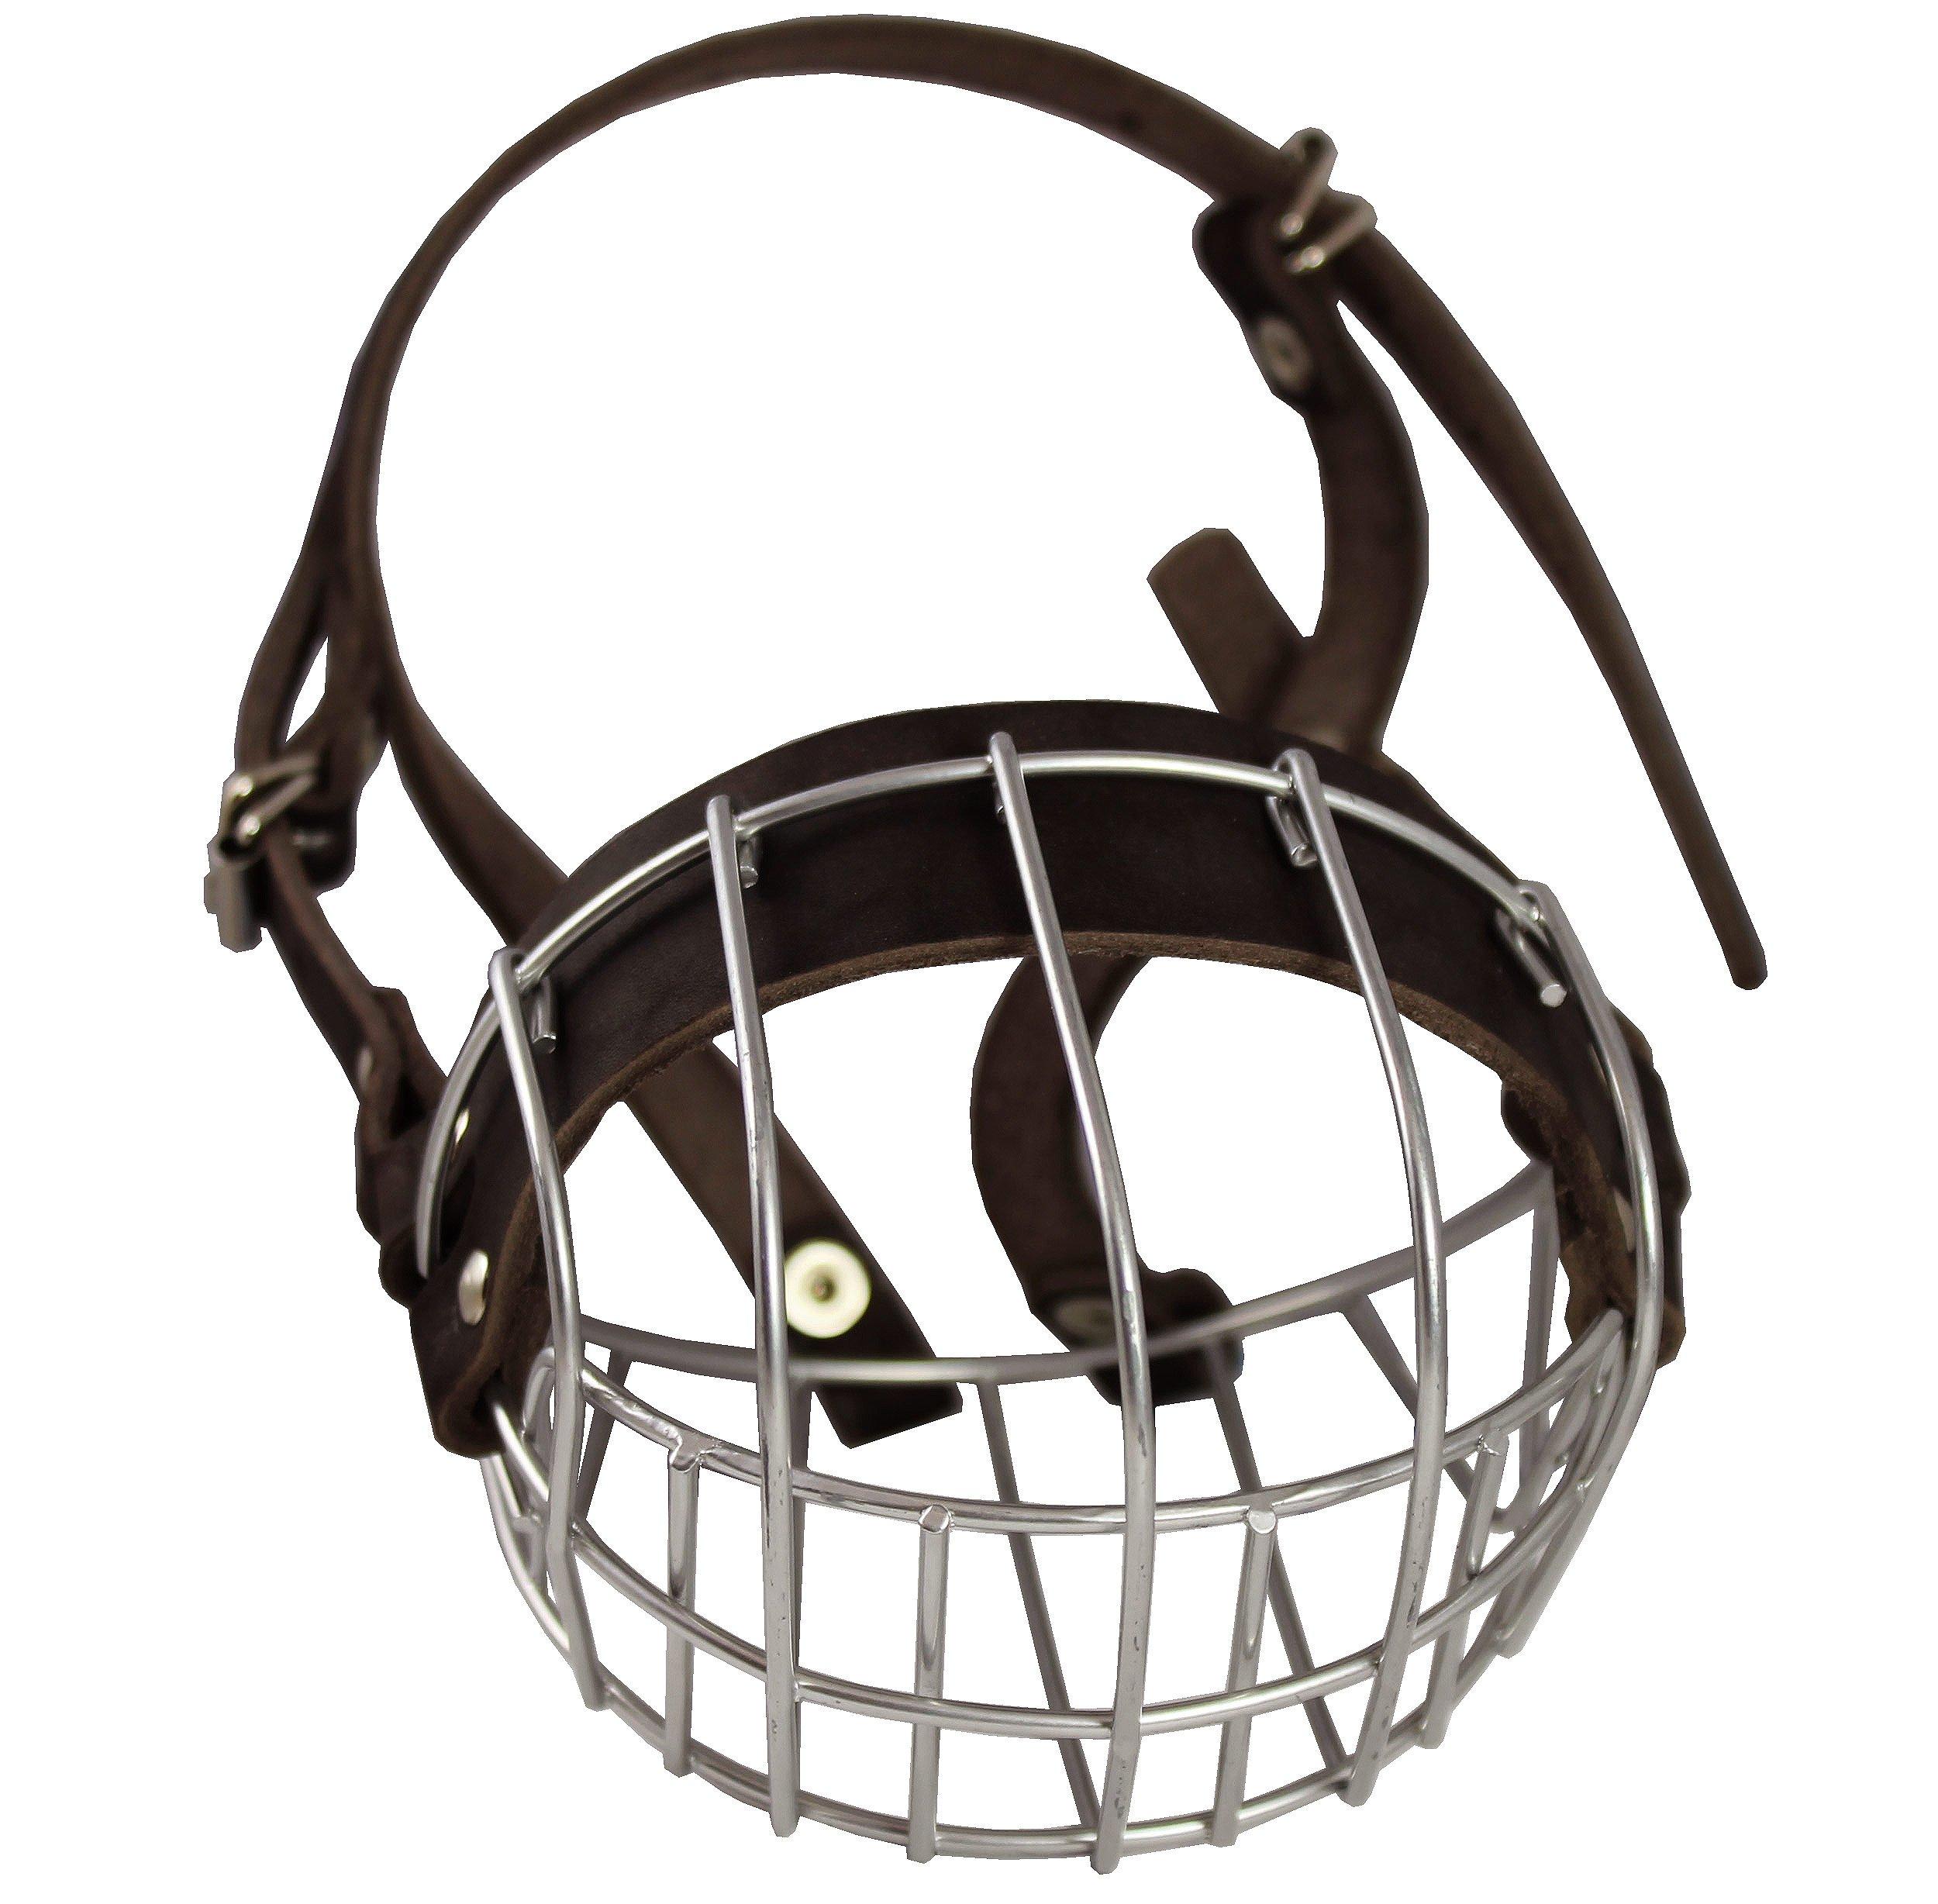 Metal Wire Basket Dog Muzzle Boxer, Bulldog Female. Circumference 13'', Length 3''